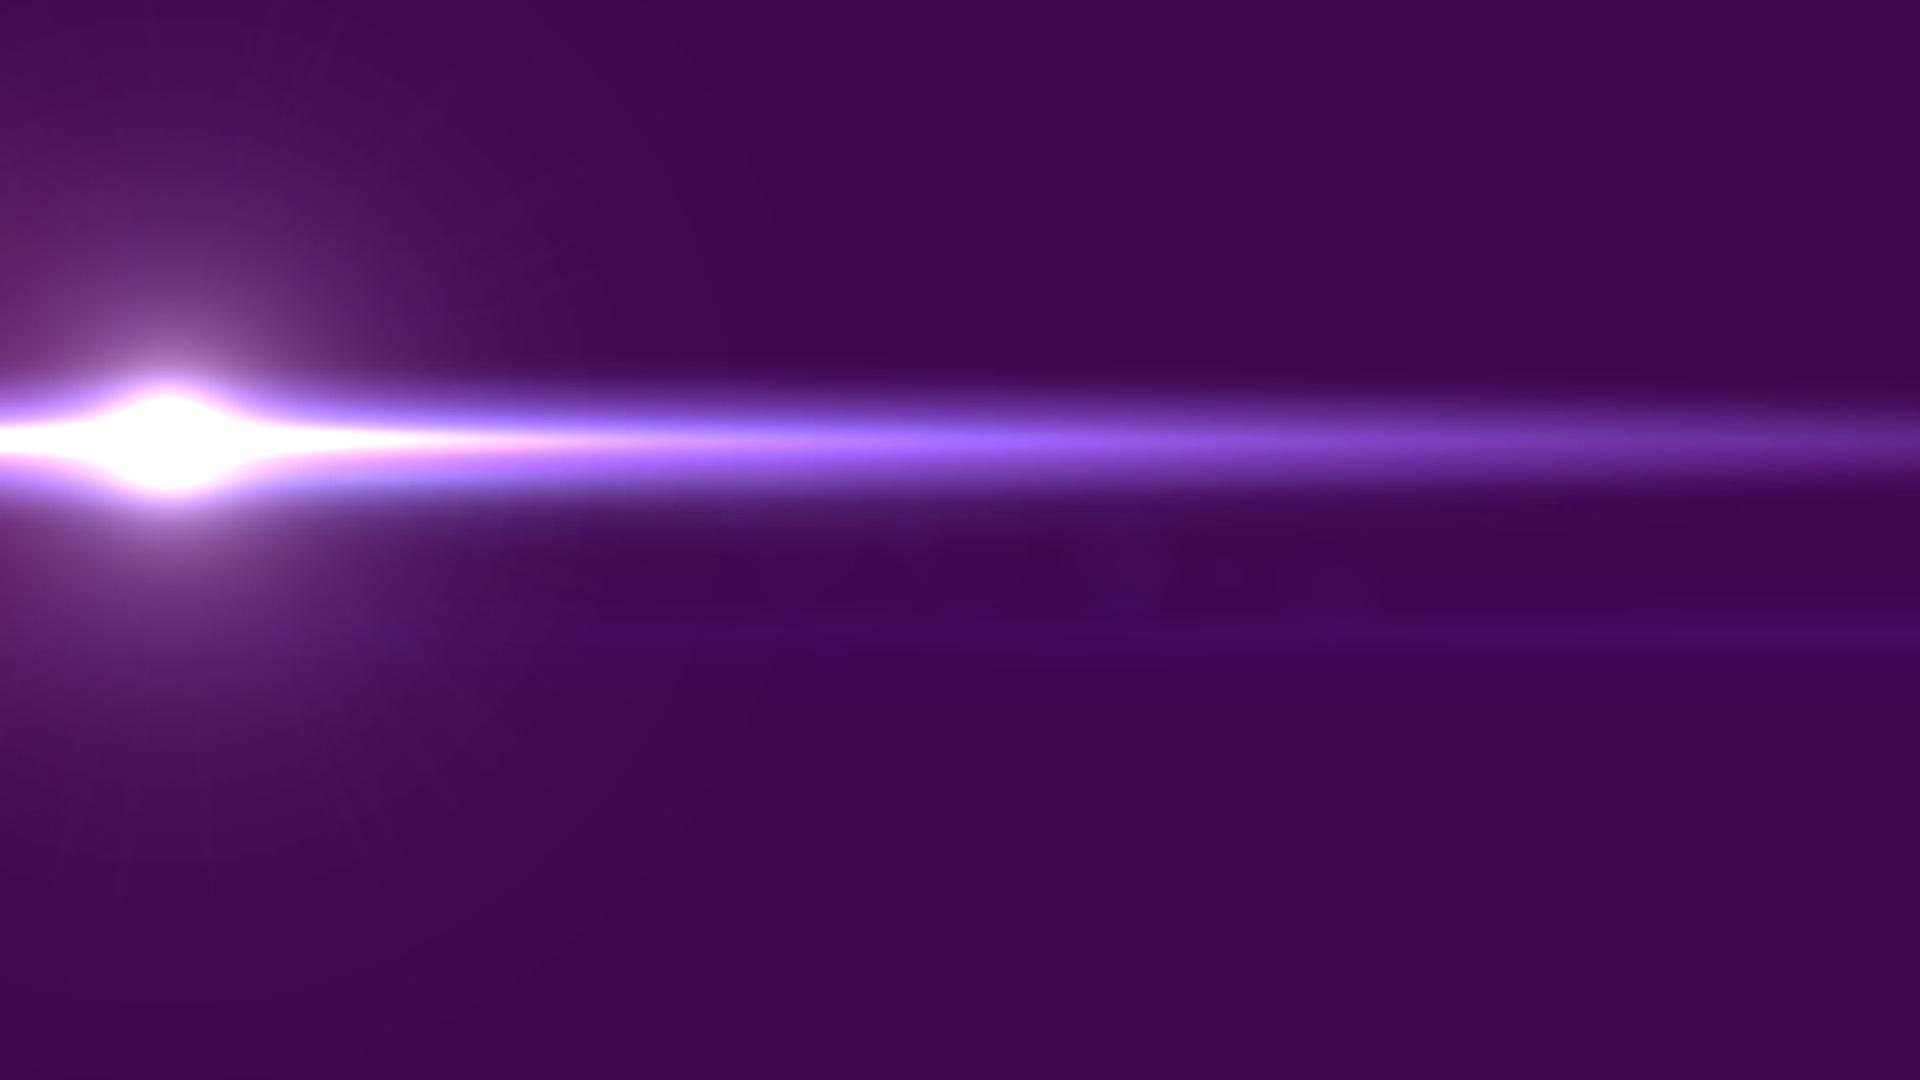 Purple bar jakkarat